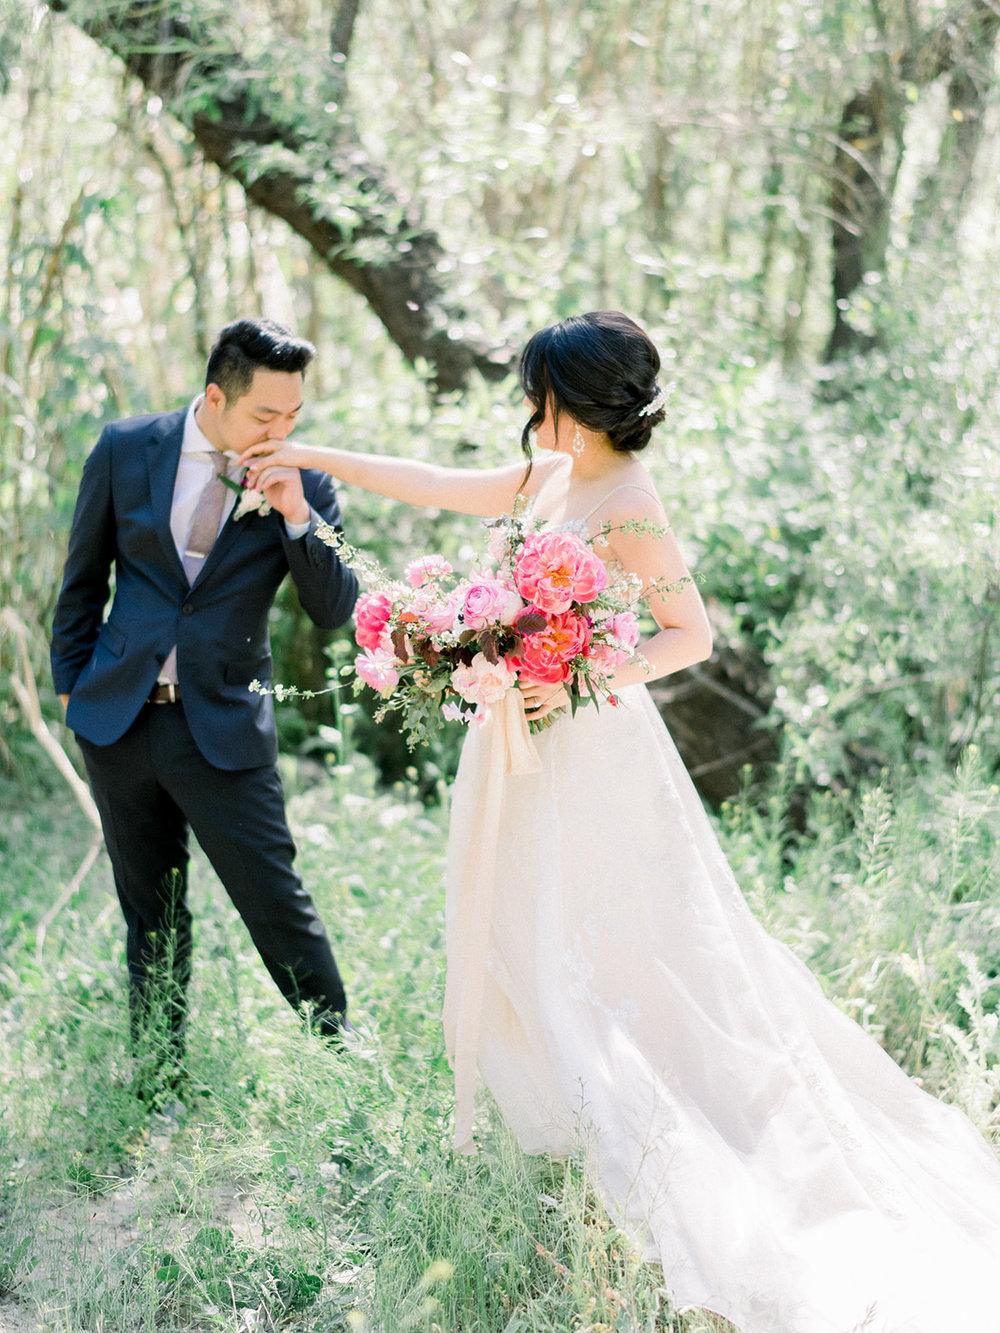 jueunandjon-etherandsmith-wedding-341.jpg